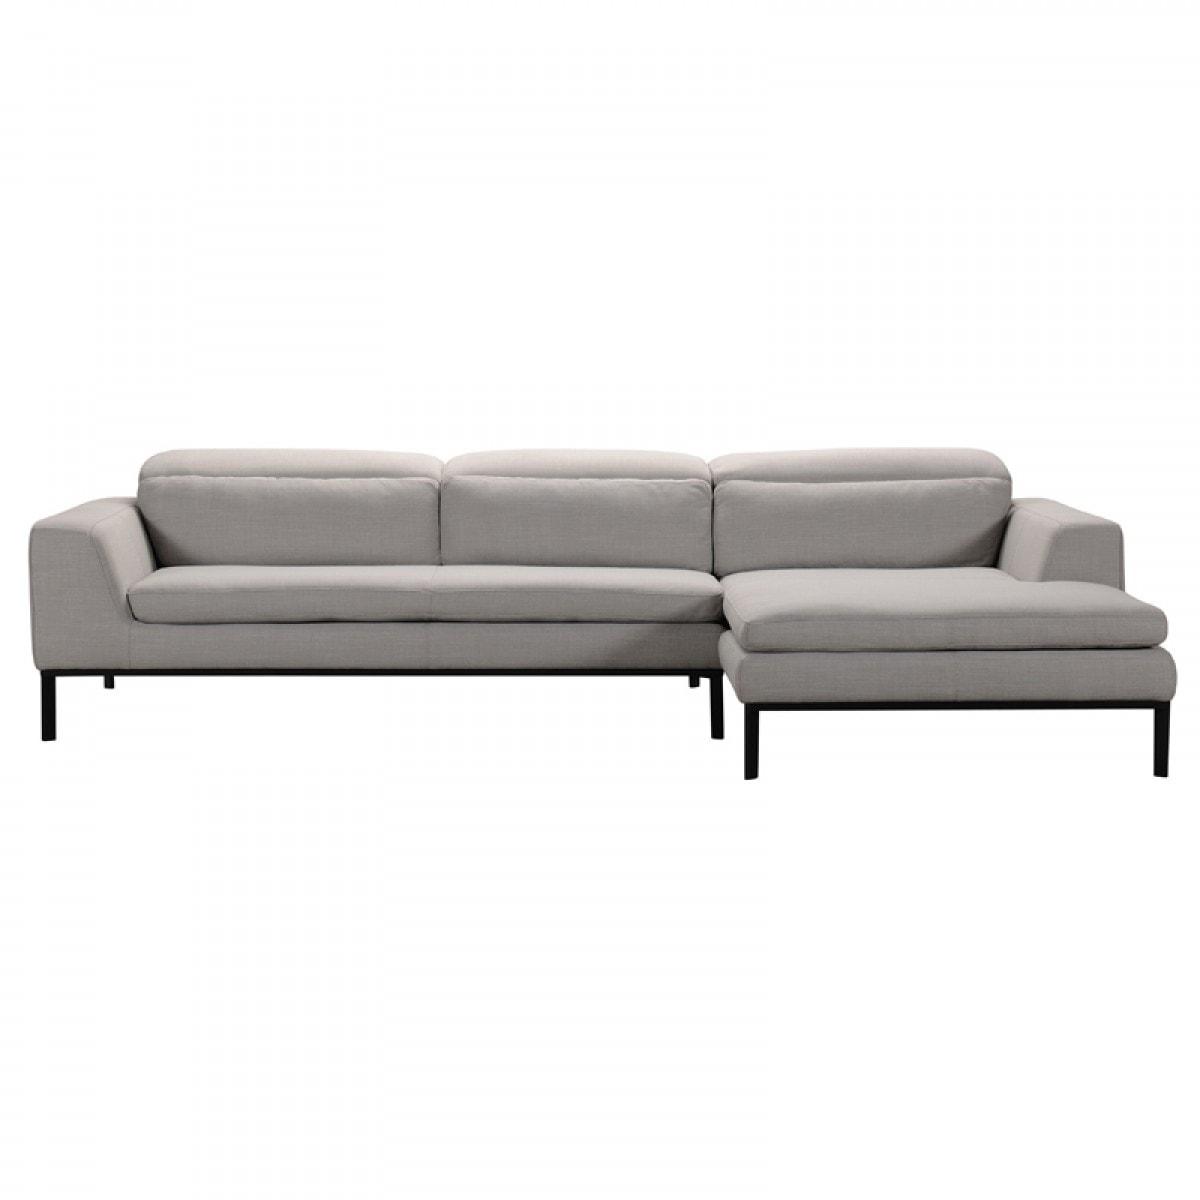 Shop Divani Casa Clayton Modern Fabric Sectional Sofa - On Sale ...